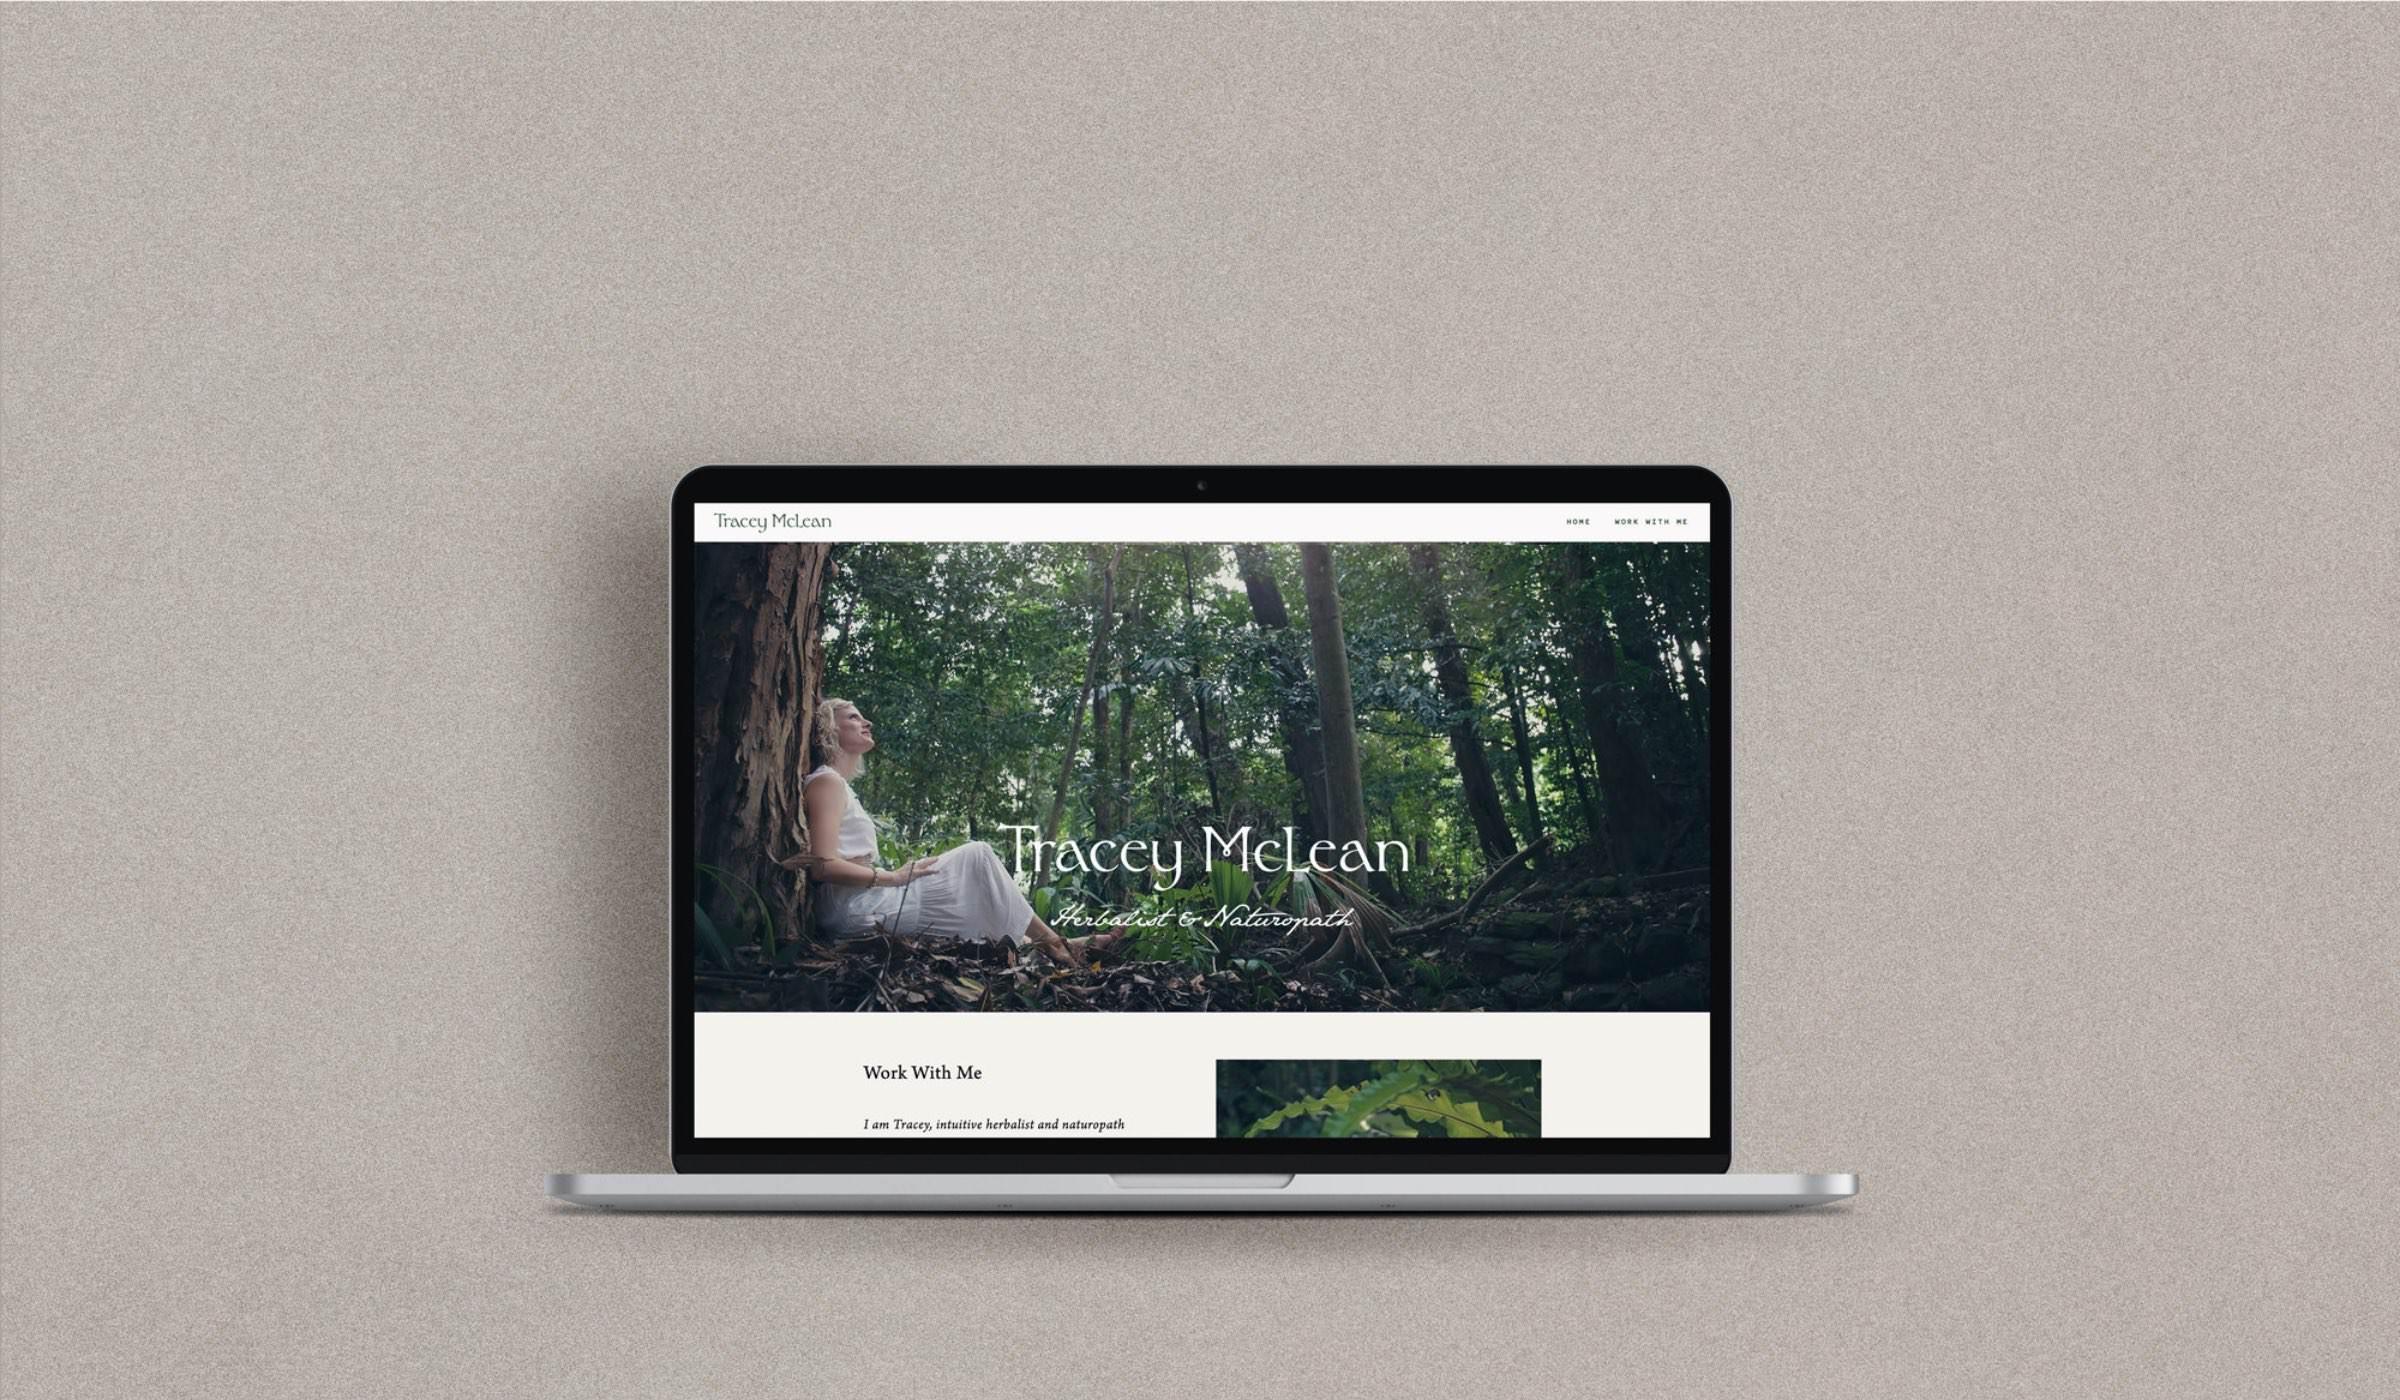 Tracey McLean website design